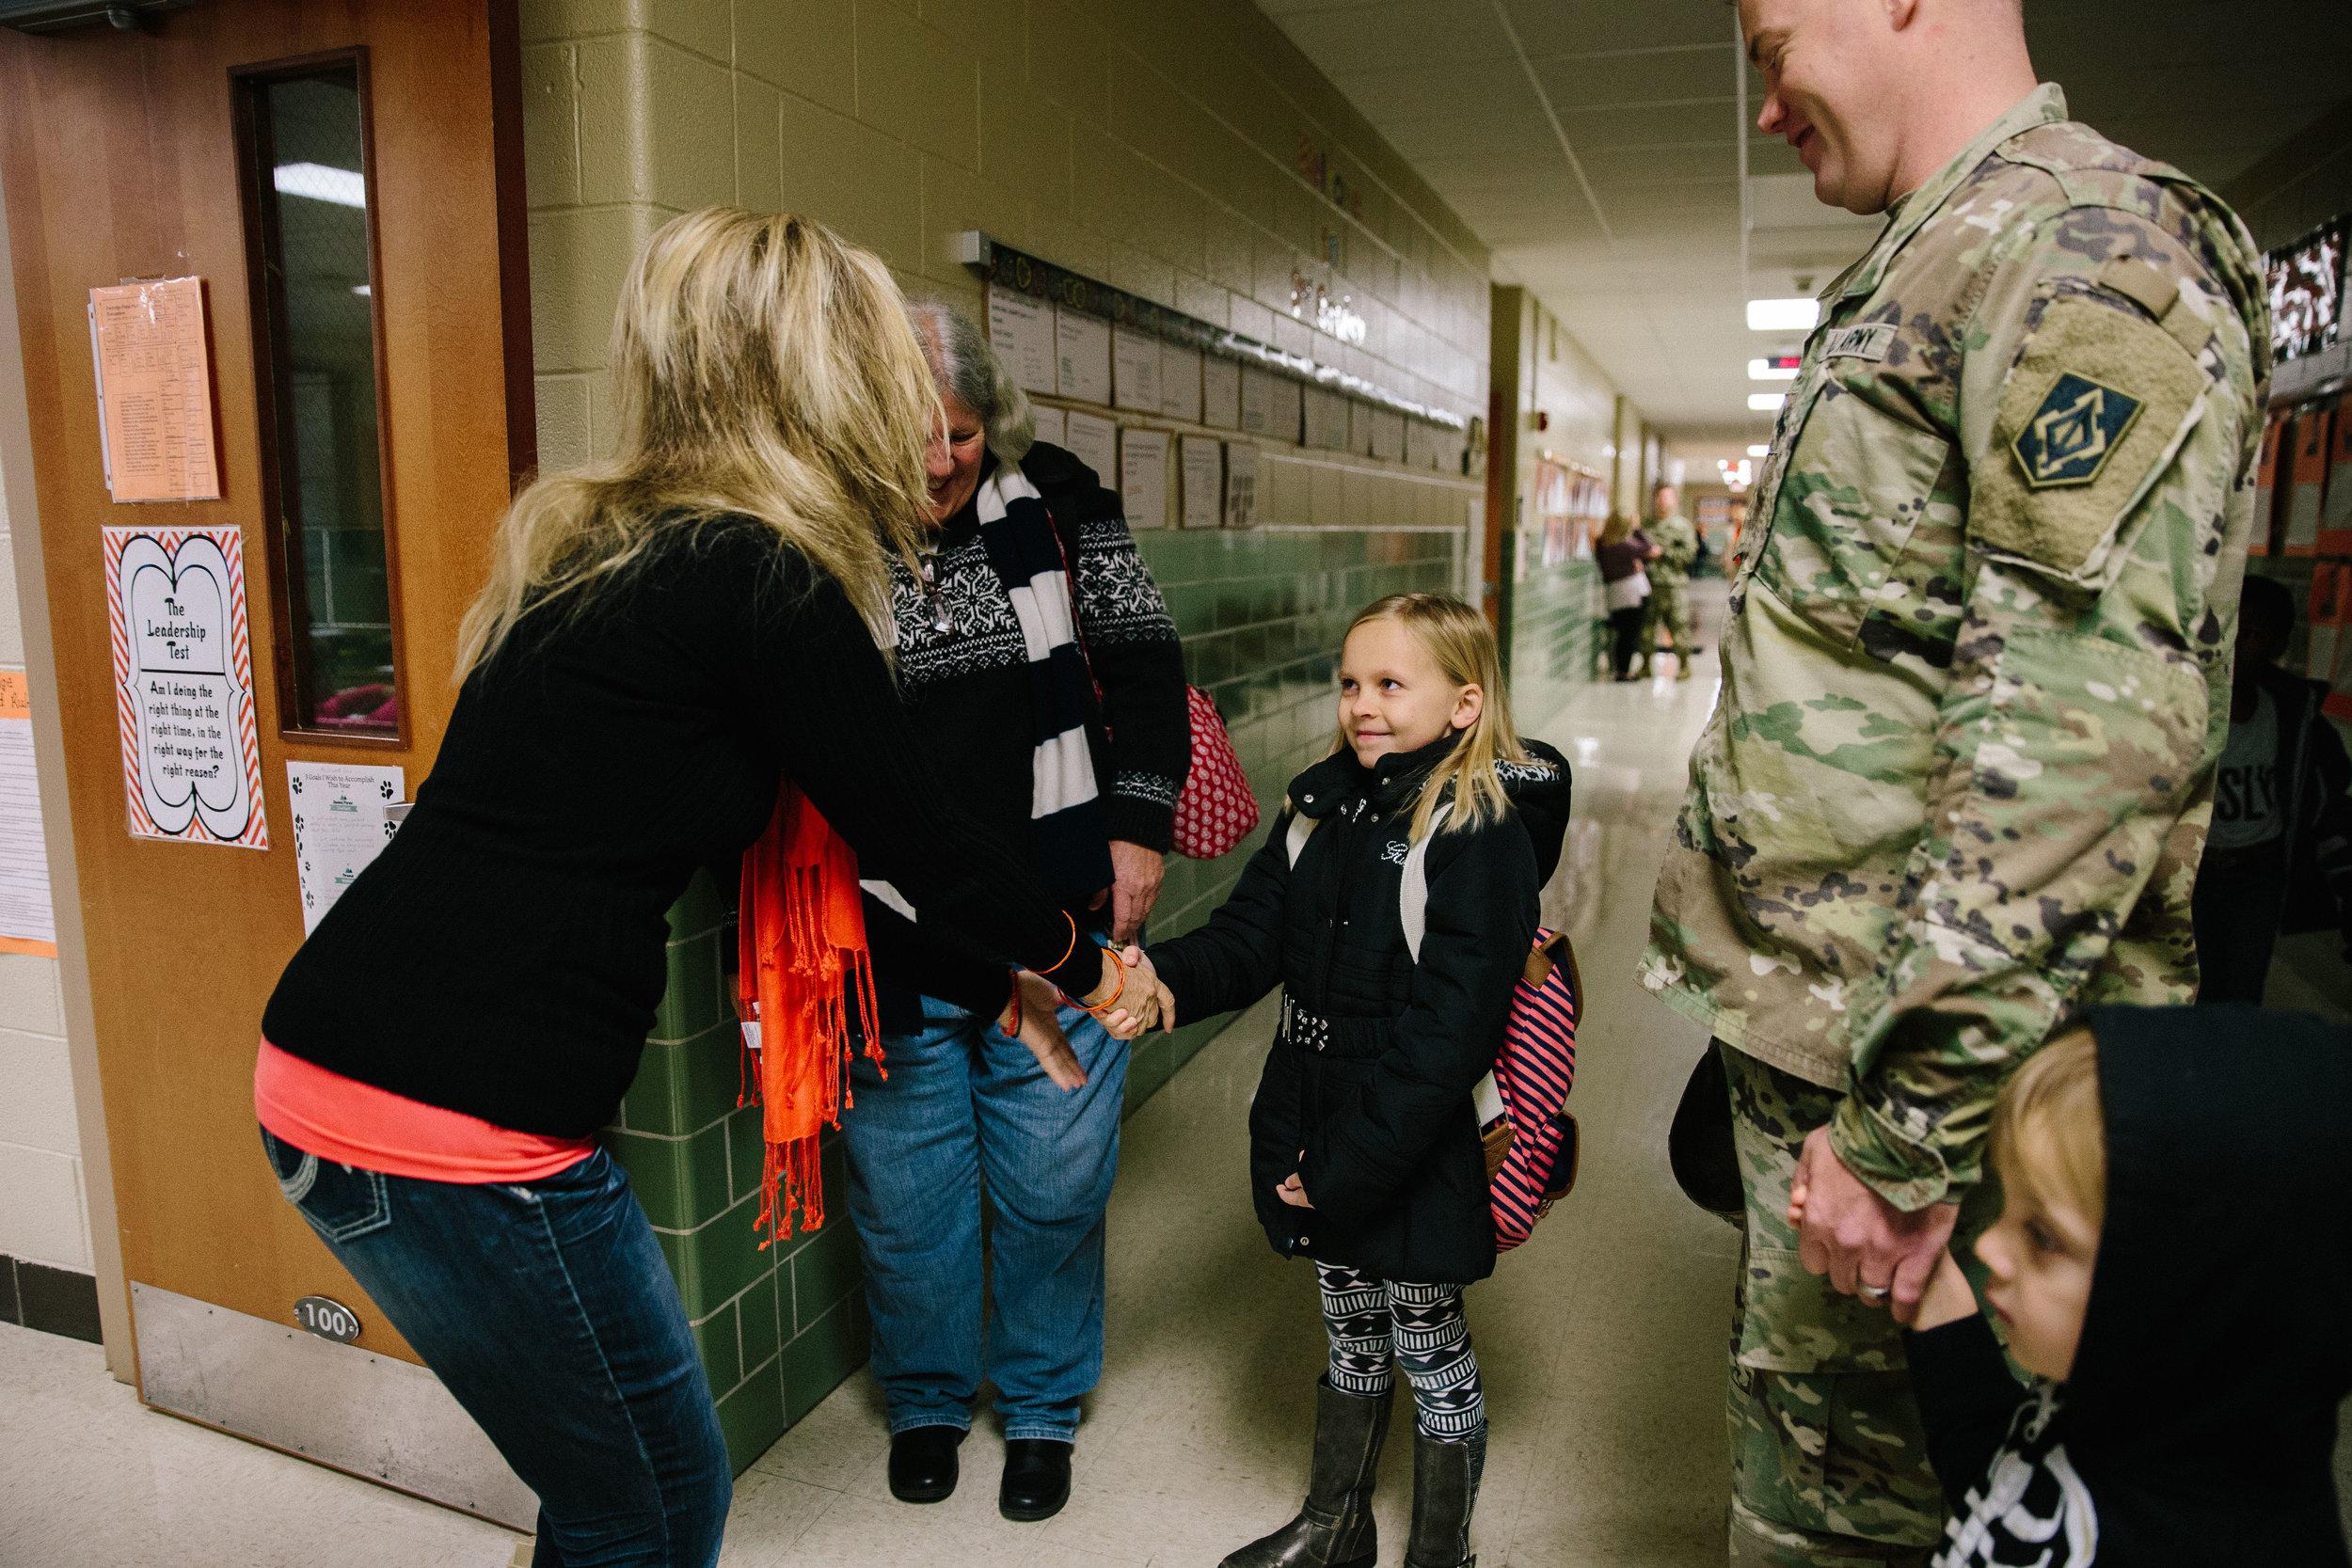 girl meeting her new teacher on first day of school - fort leonard wood documentary photographer